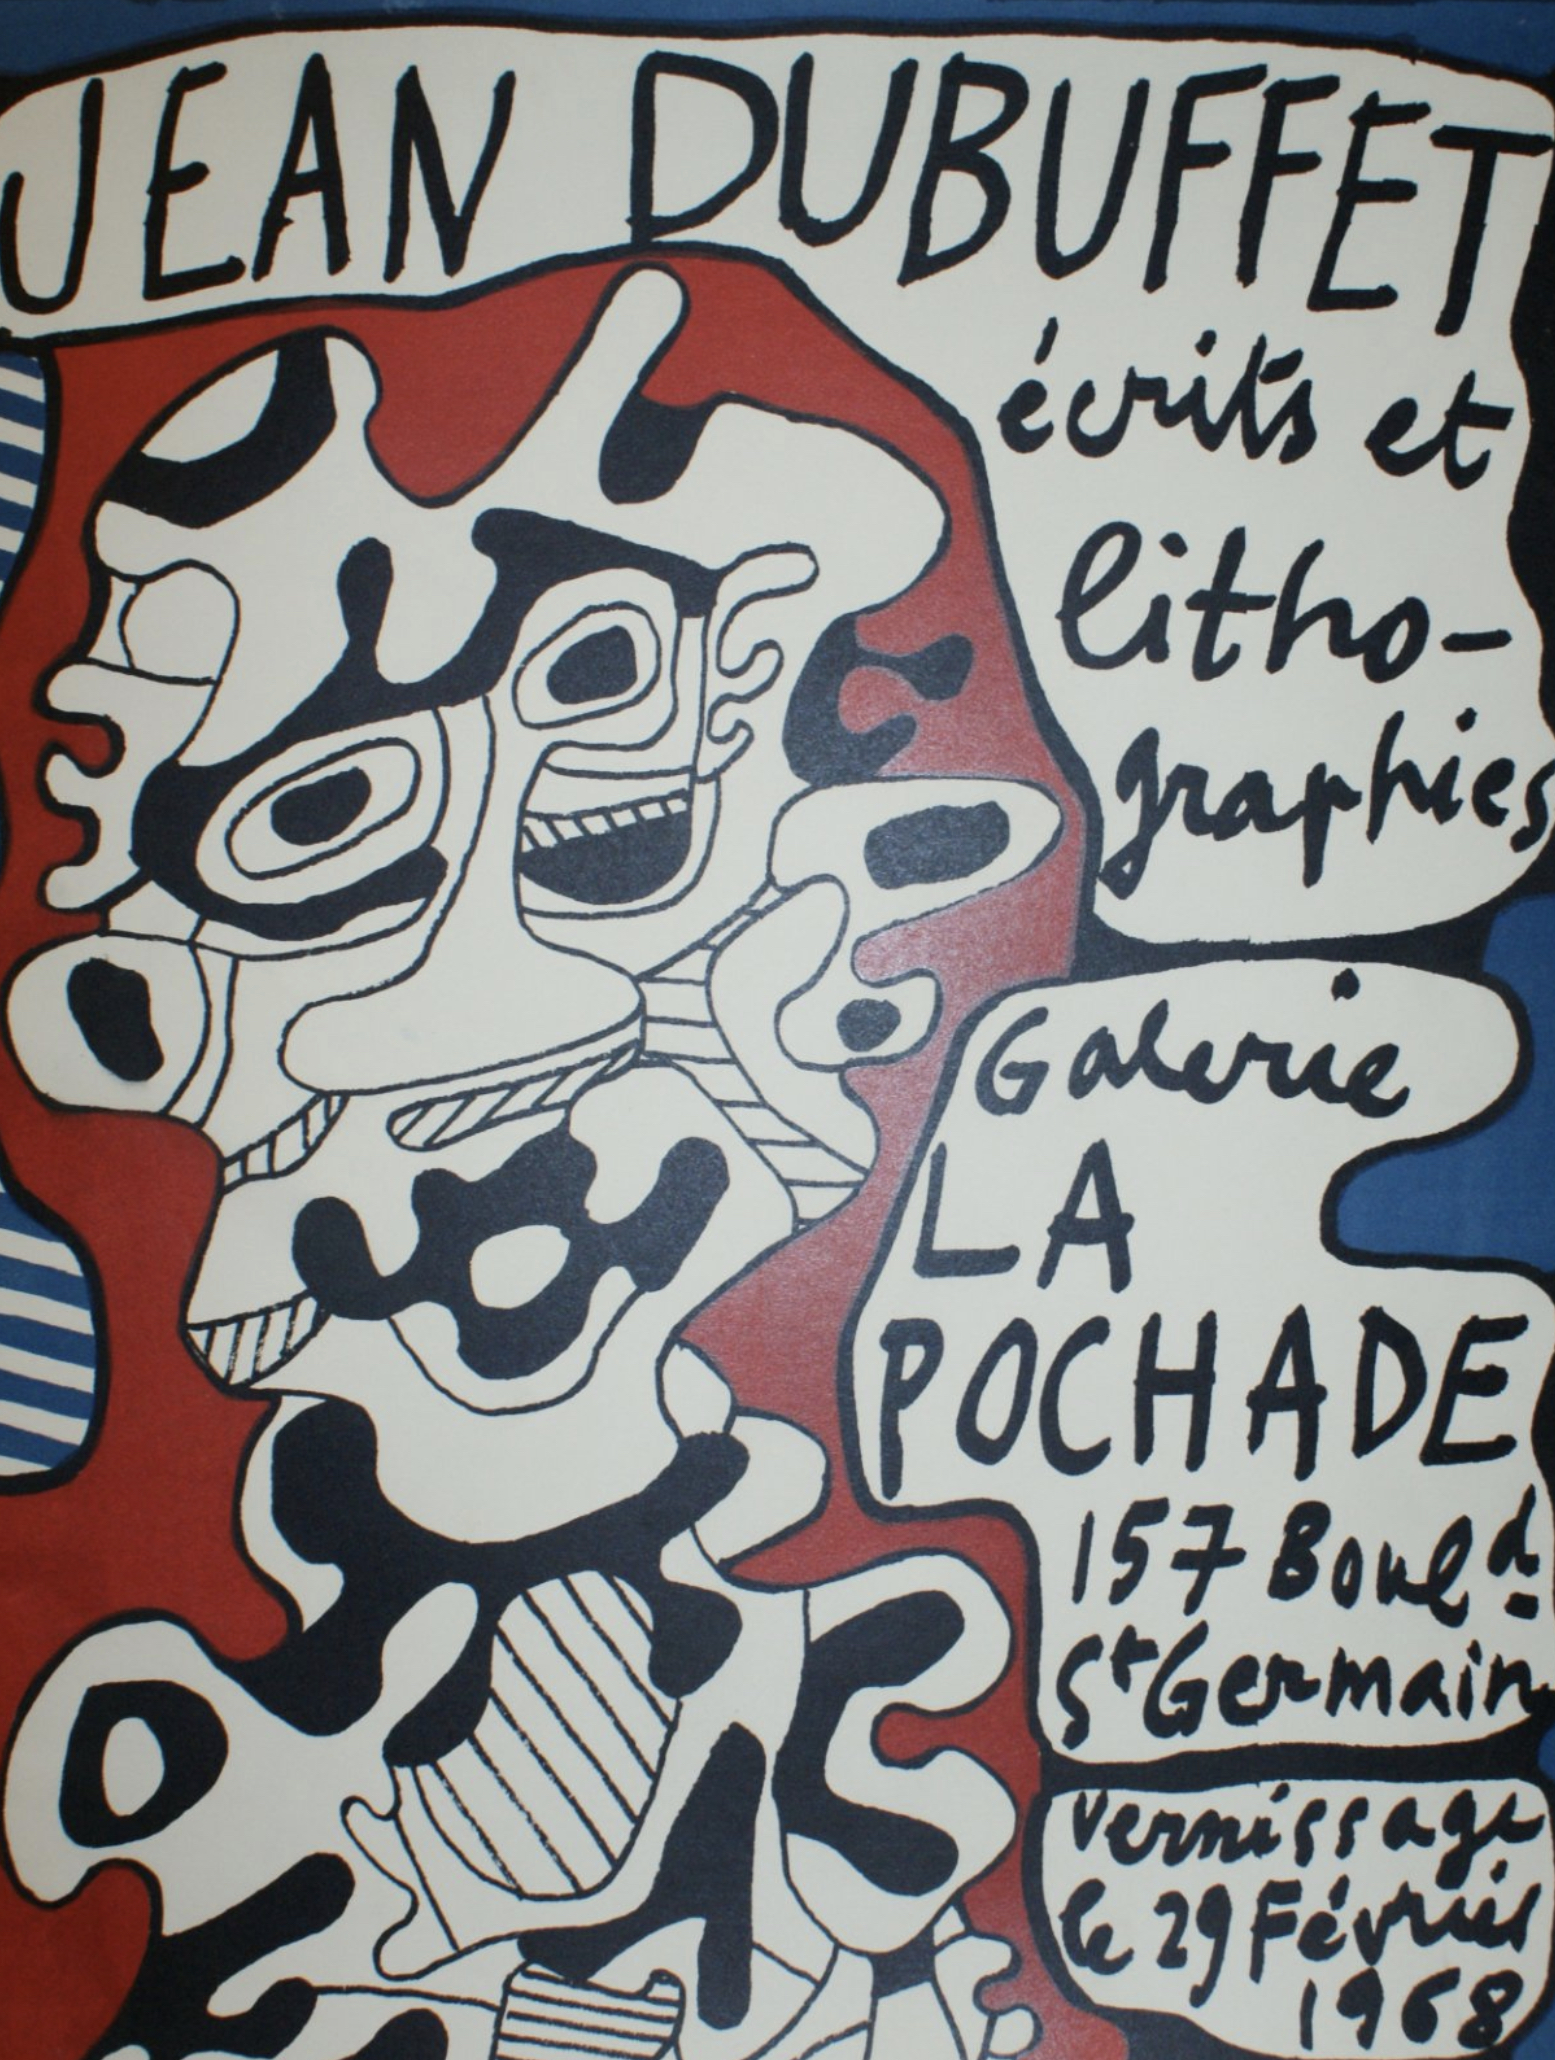 Jean Dubuffet GALERIE LA POCHADE Original Vintage Poster